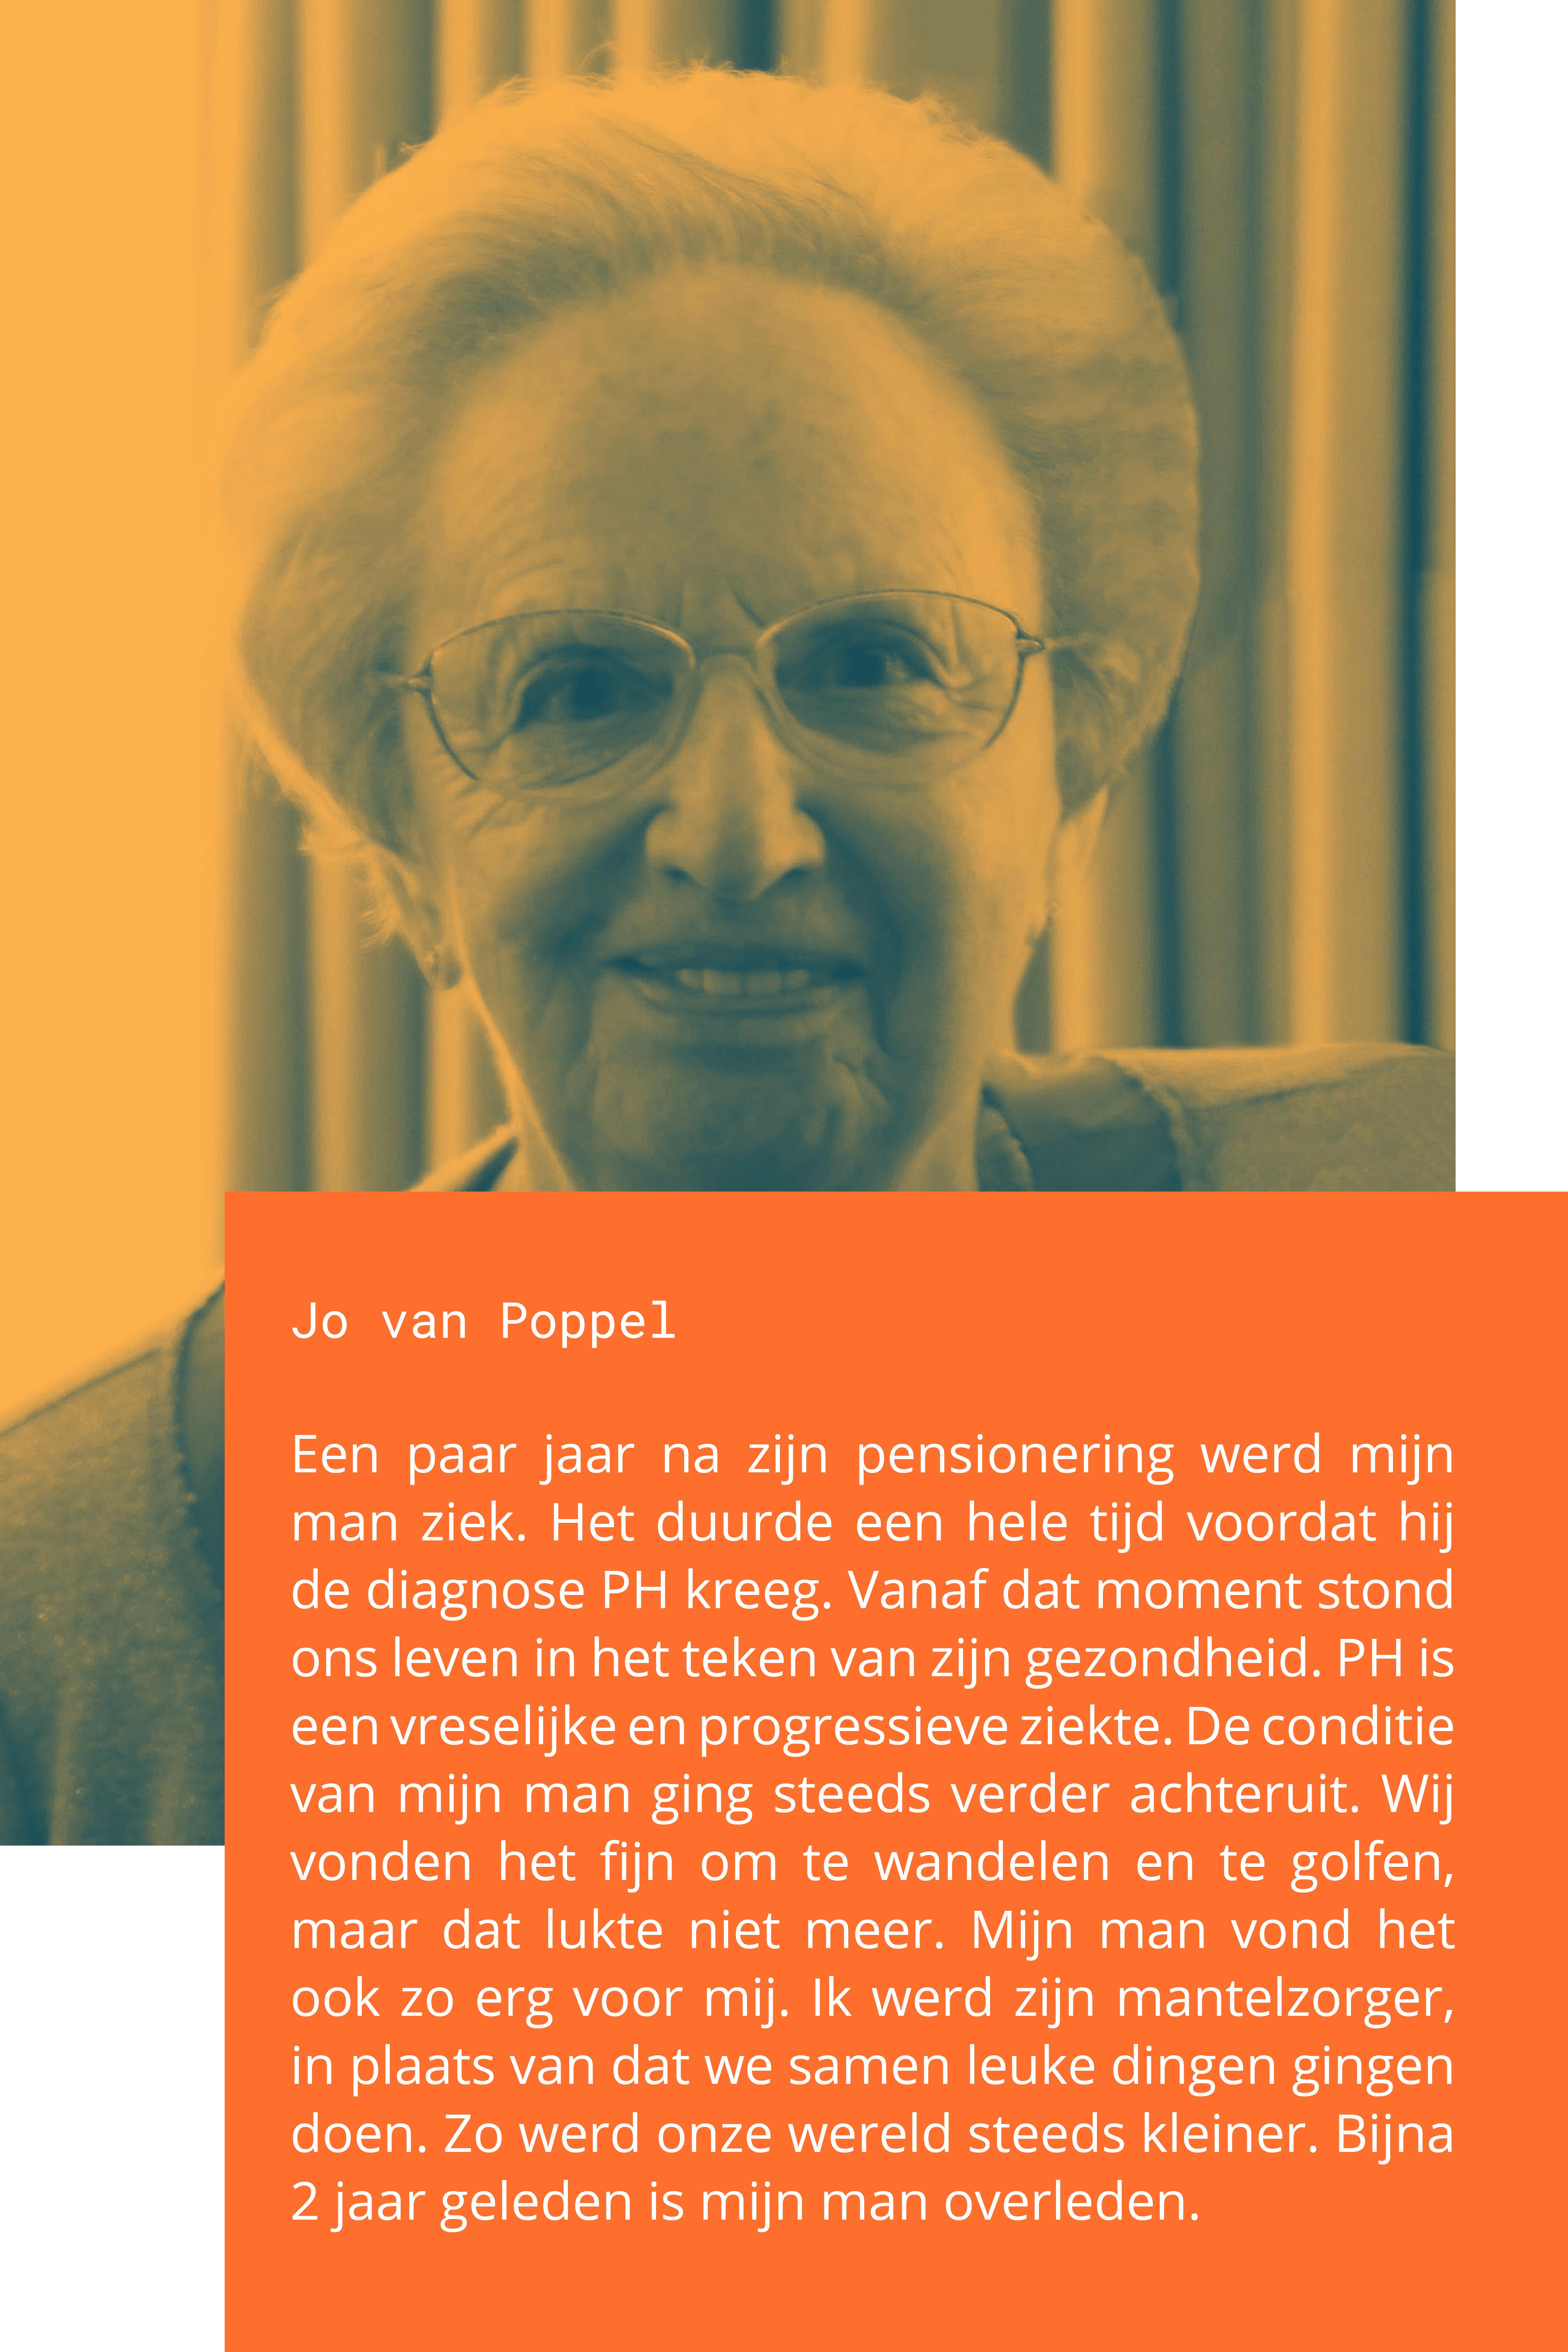 Adembenemend 2020 - Social - Jo van Poppel (1)